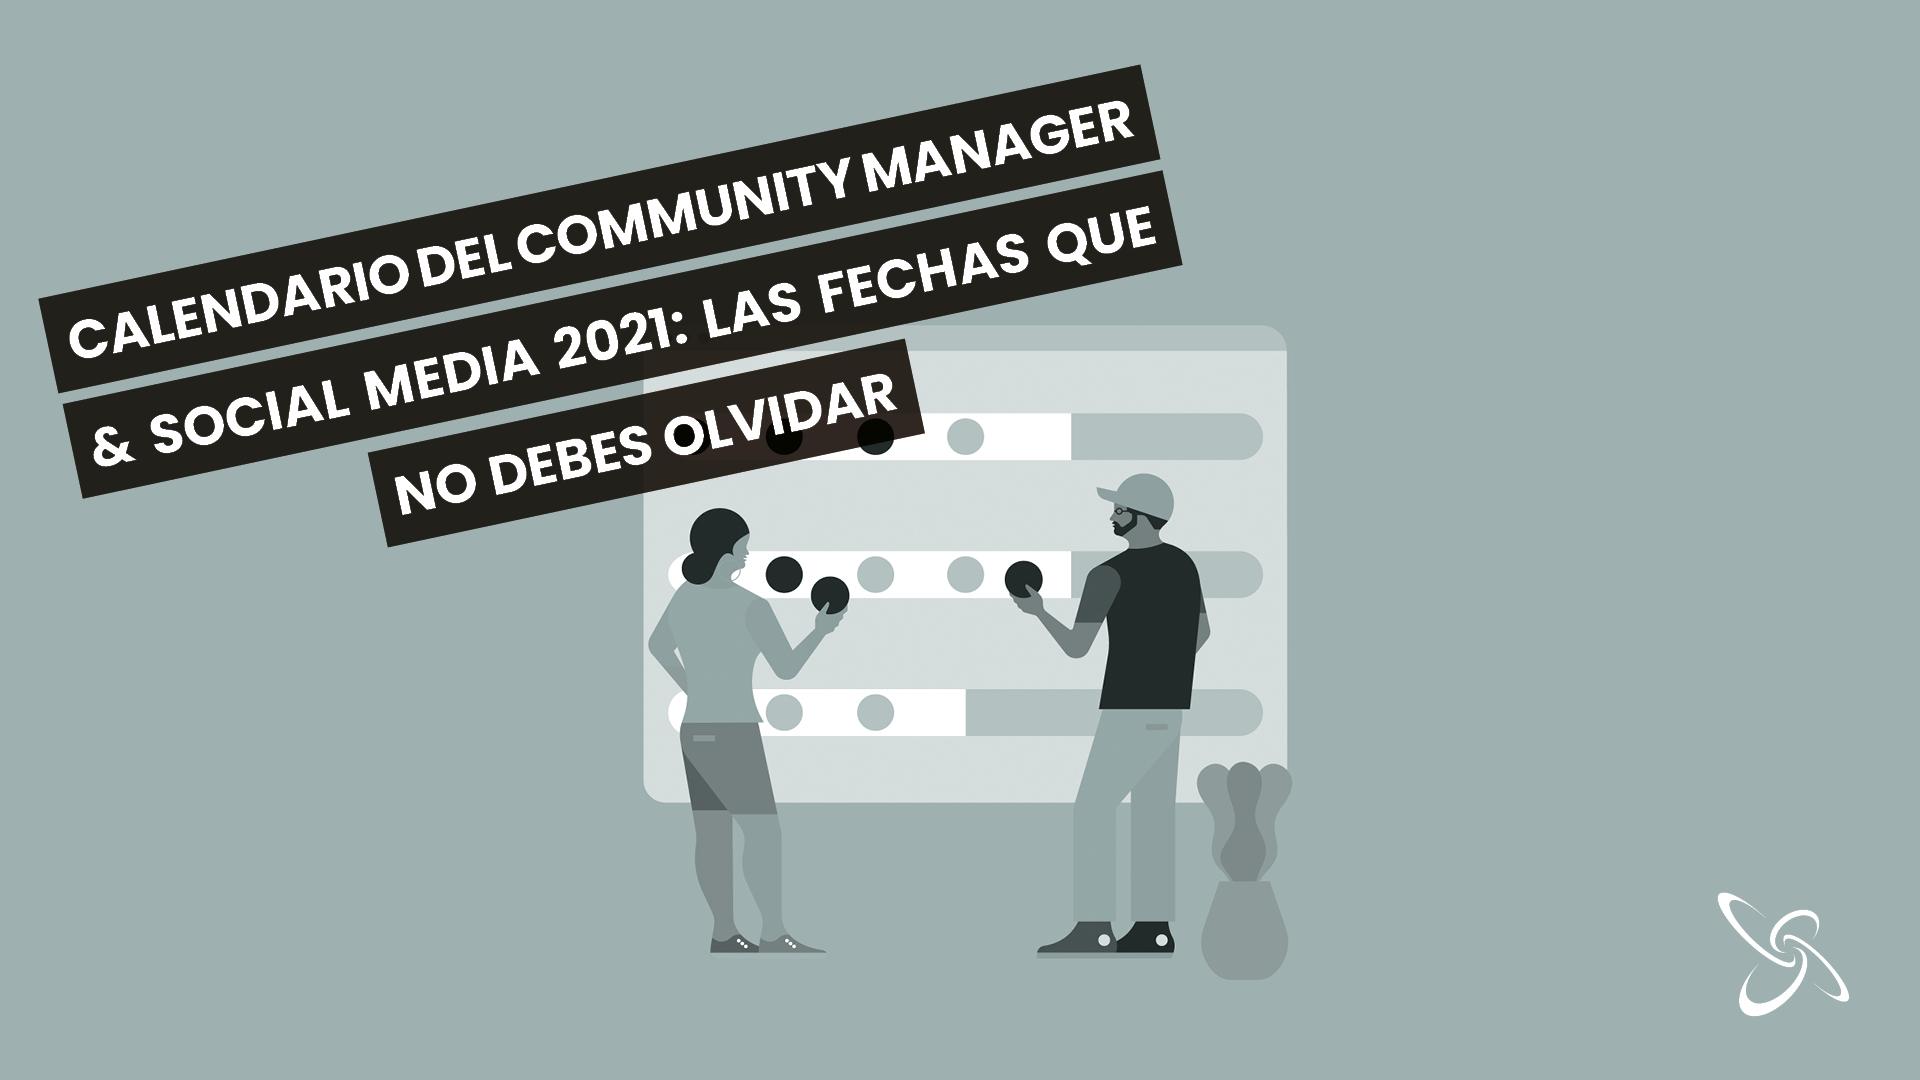 Calendario del Community Manager & Social Media